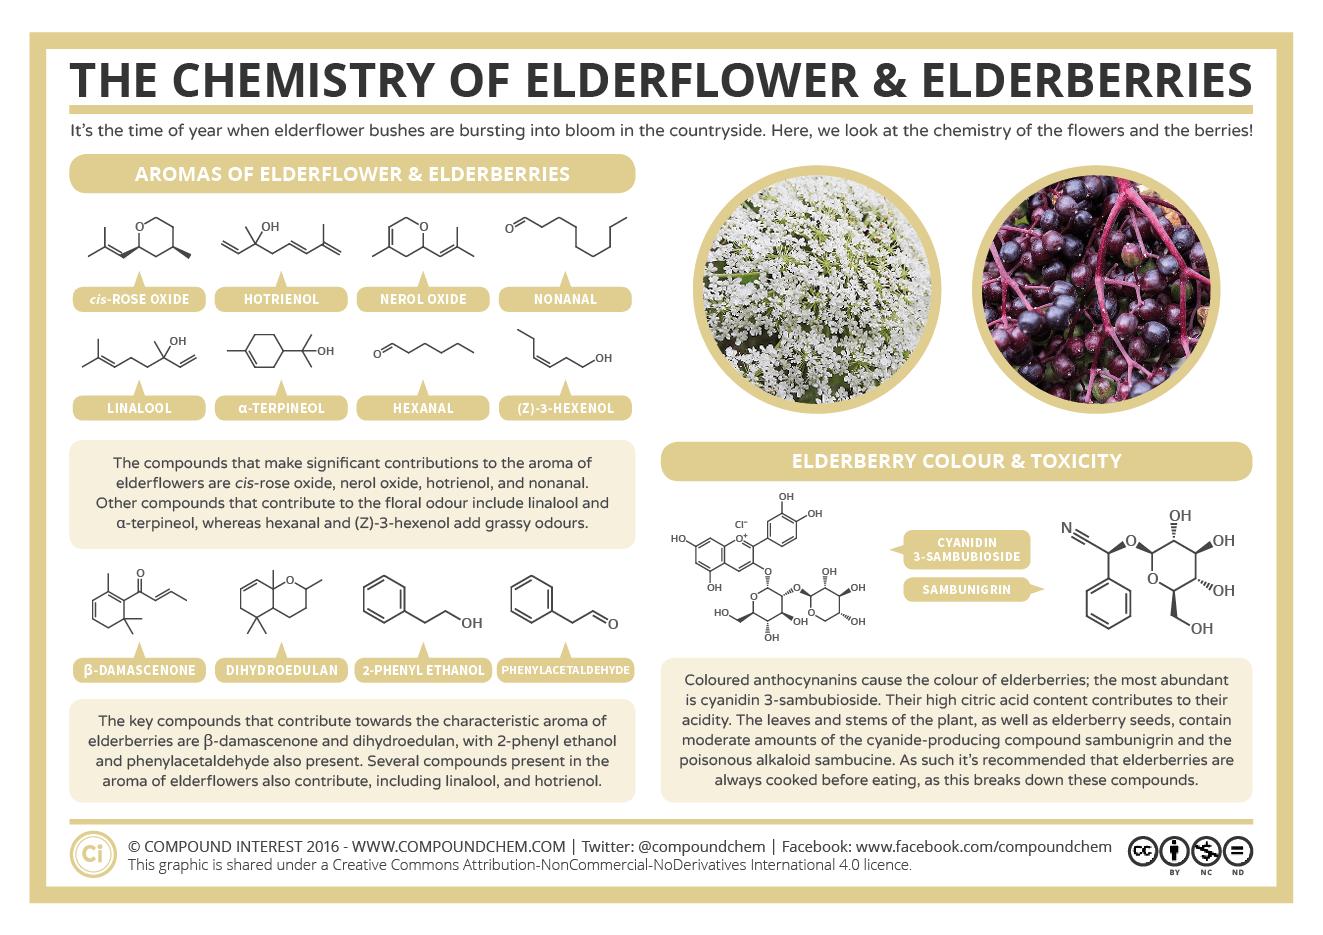 The Chemistry of Elderflowers & Elderberries: Aroma, Colour